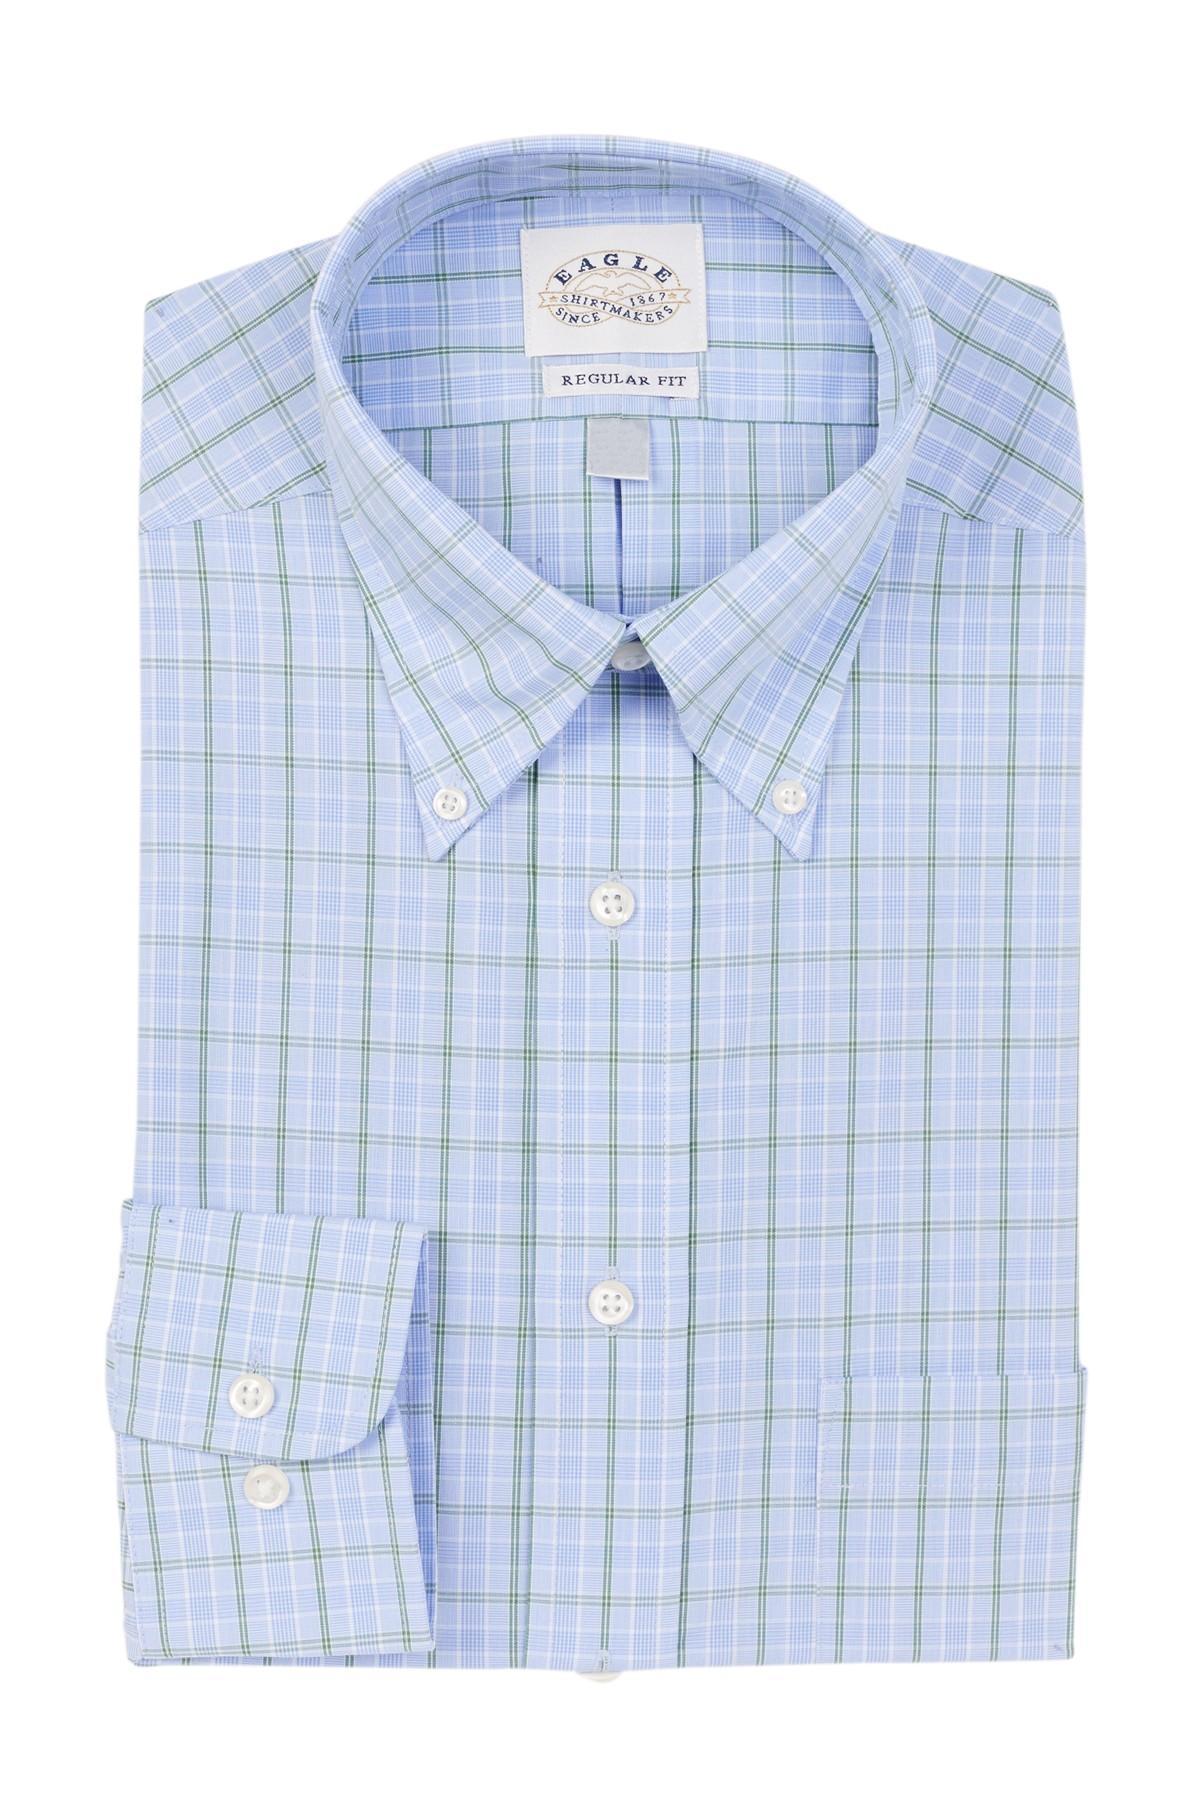 Lyst eagle check plaid regular fit dress shirt in blue for Regular fit dress shirt